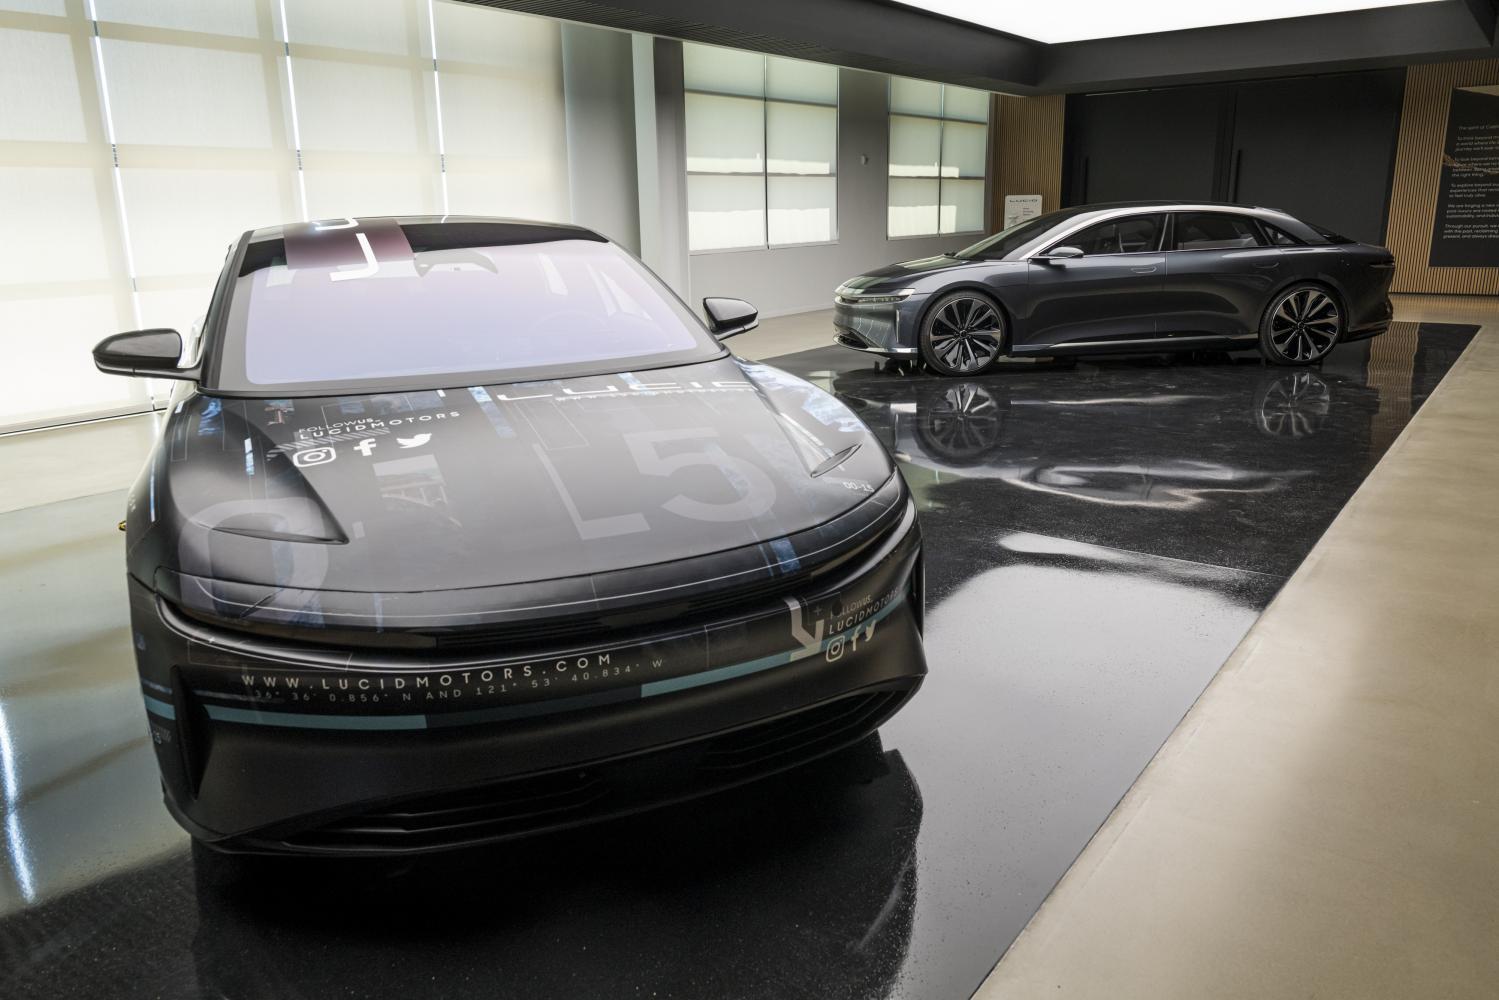 Lucid's luxury sedan first EV with 500-mile driving range